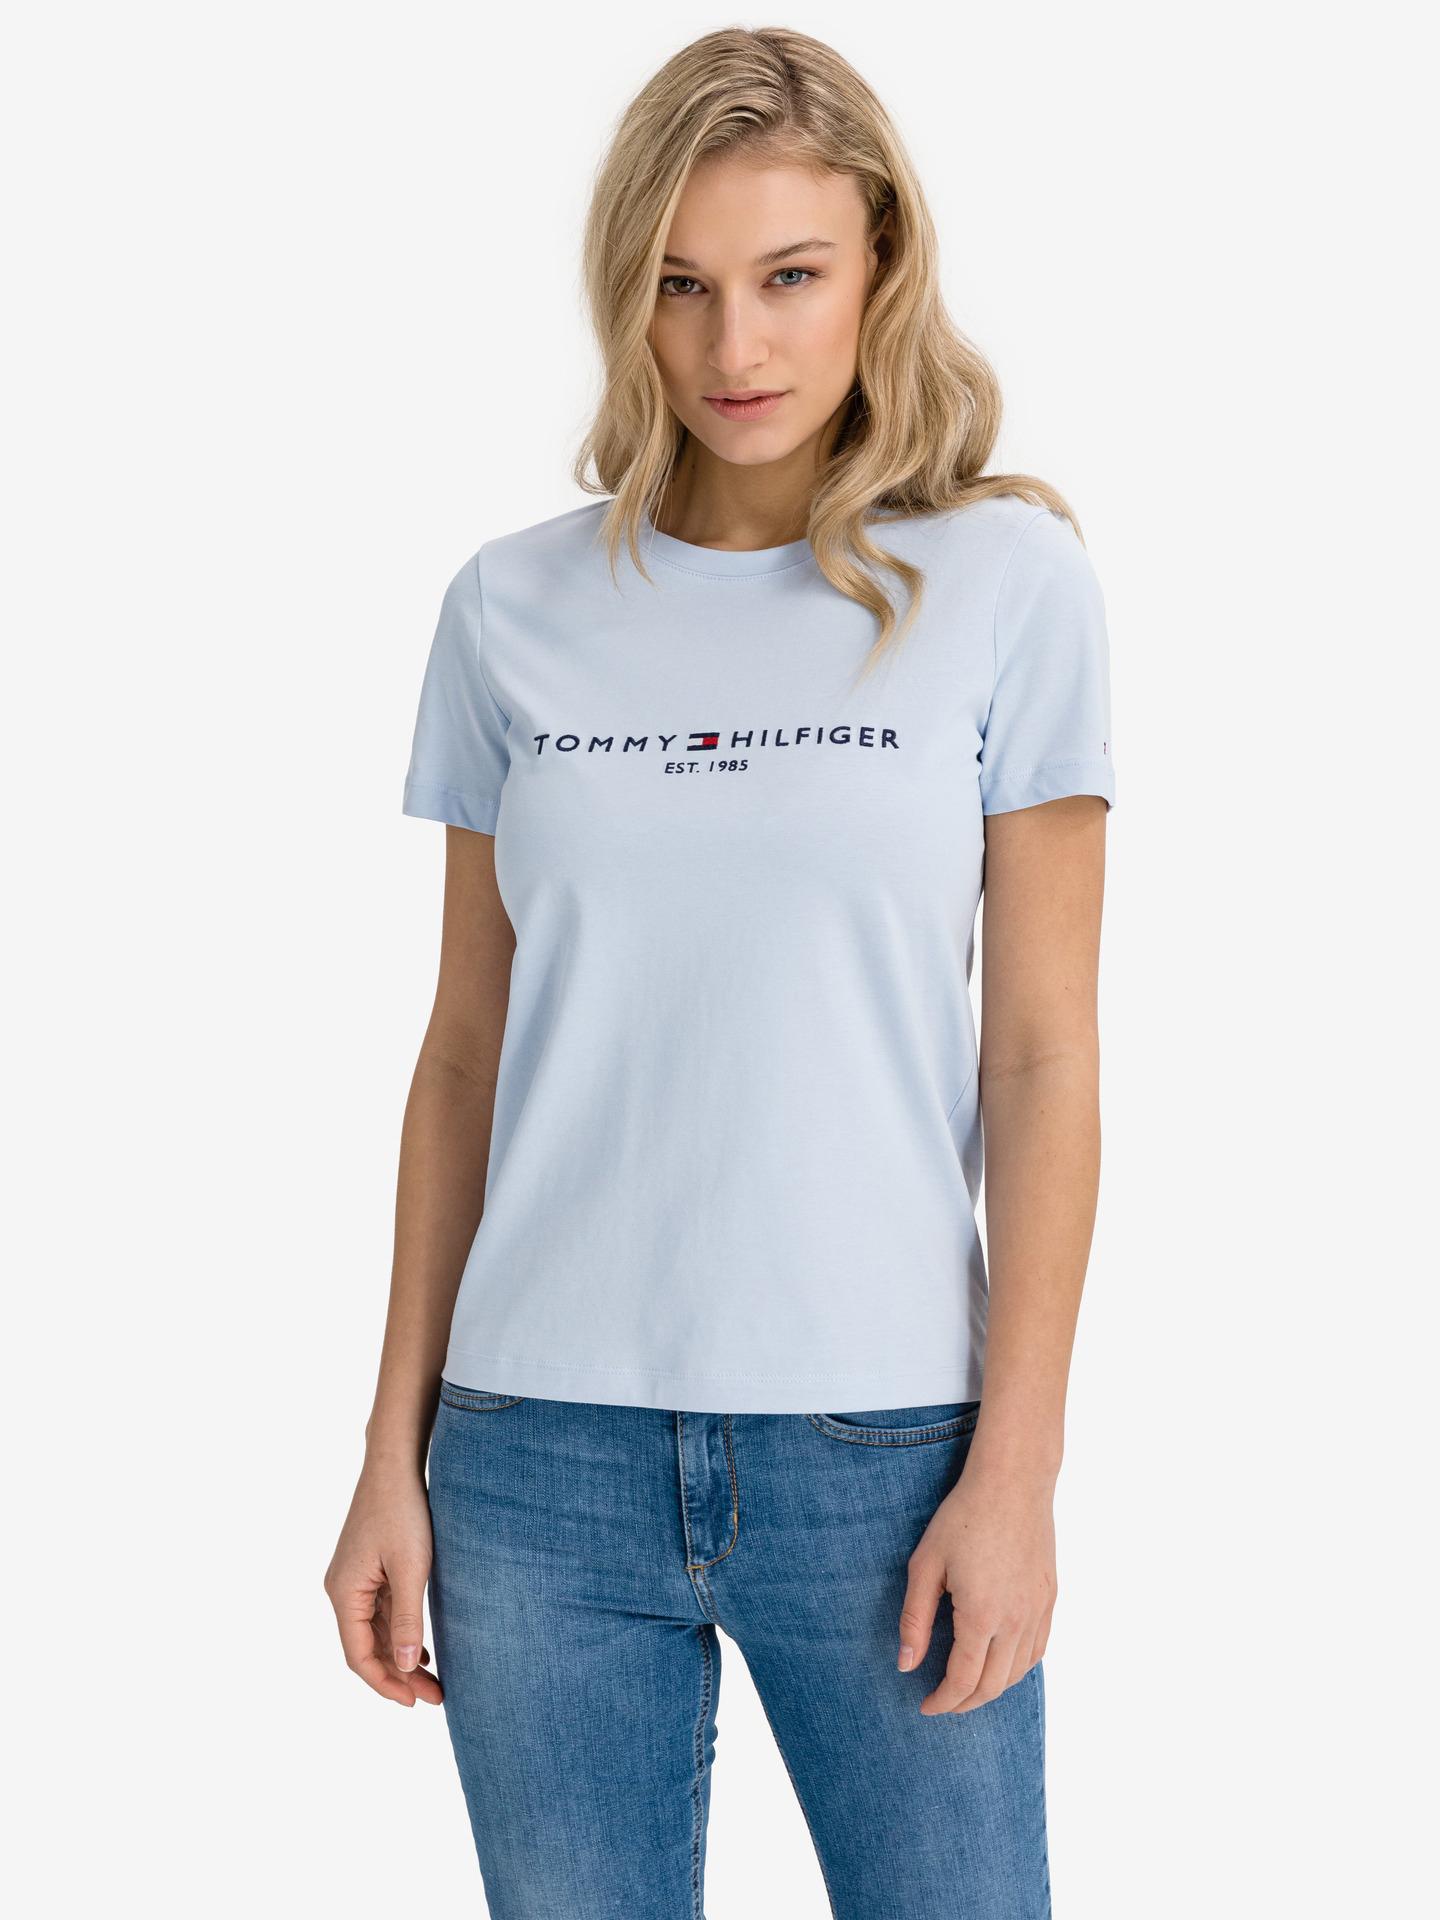 Tommy Hilfiger women´s T-shirt Essential